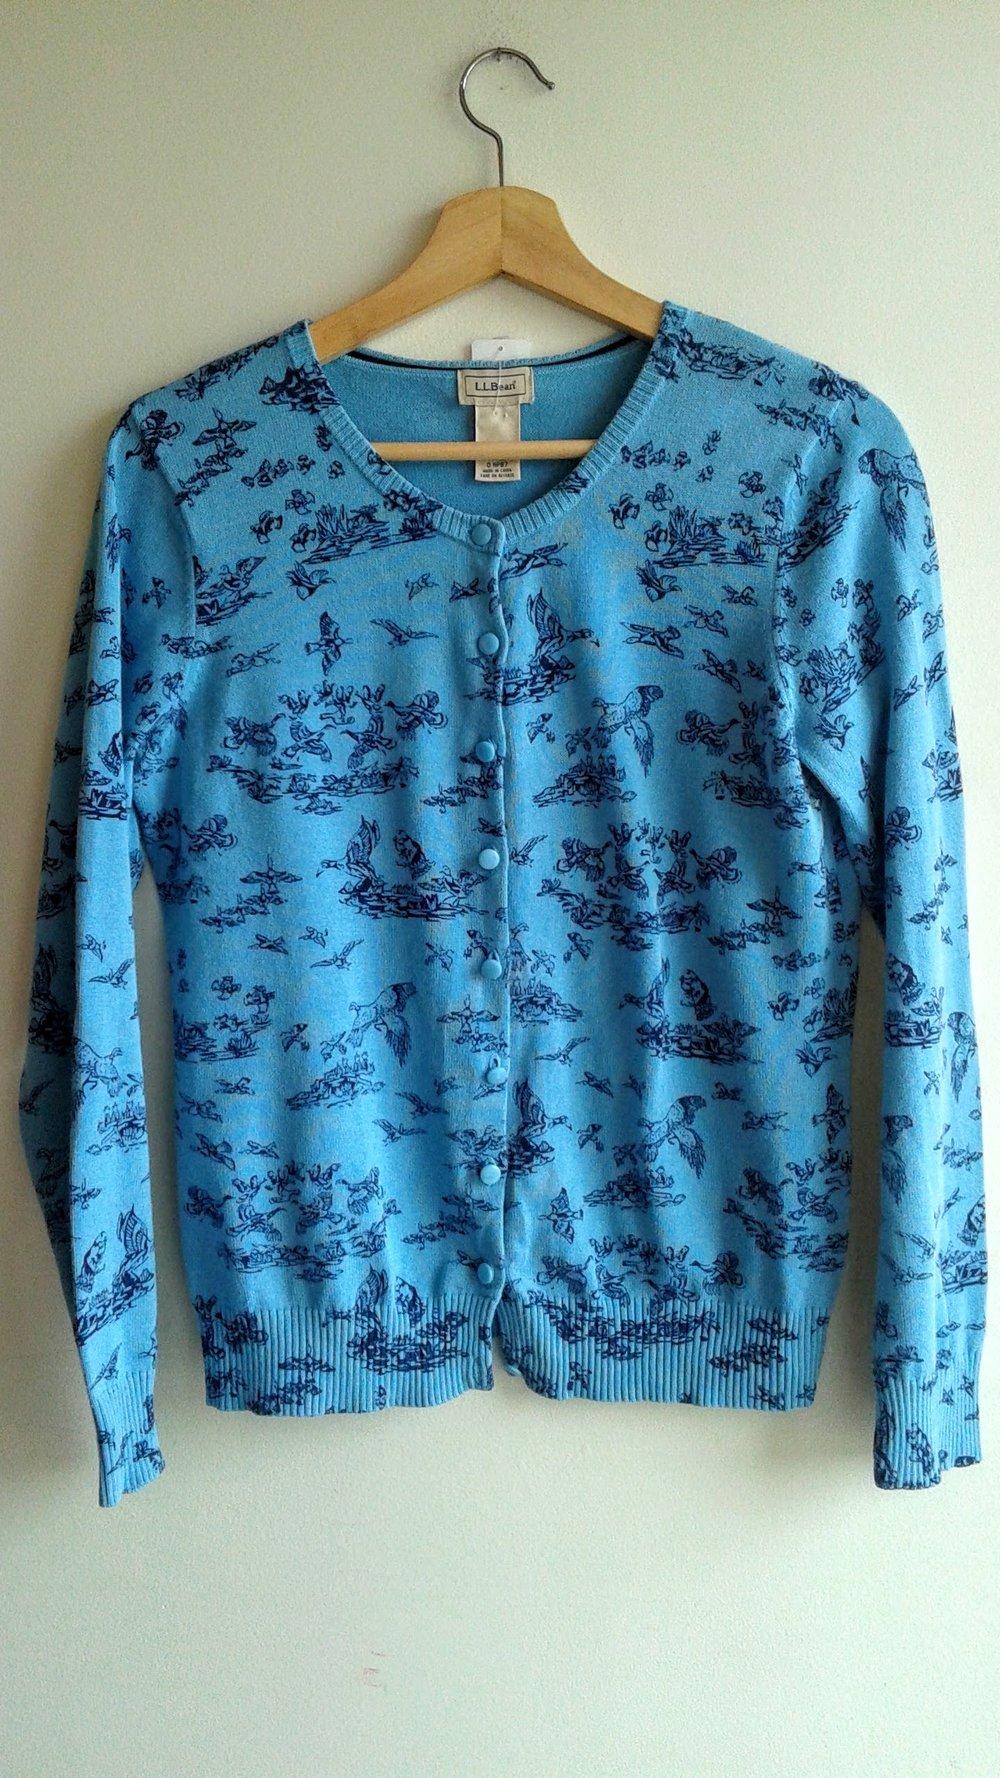 LL Bean cardigan; Size M, $20